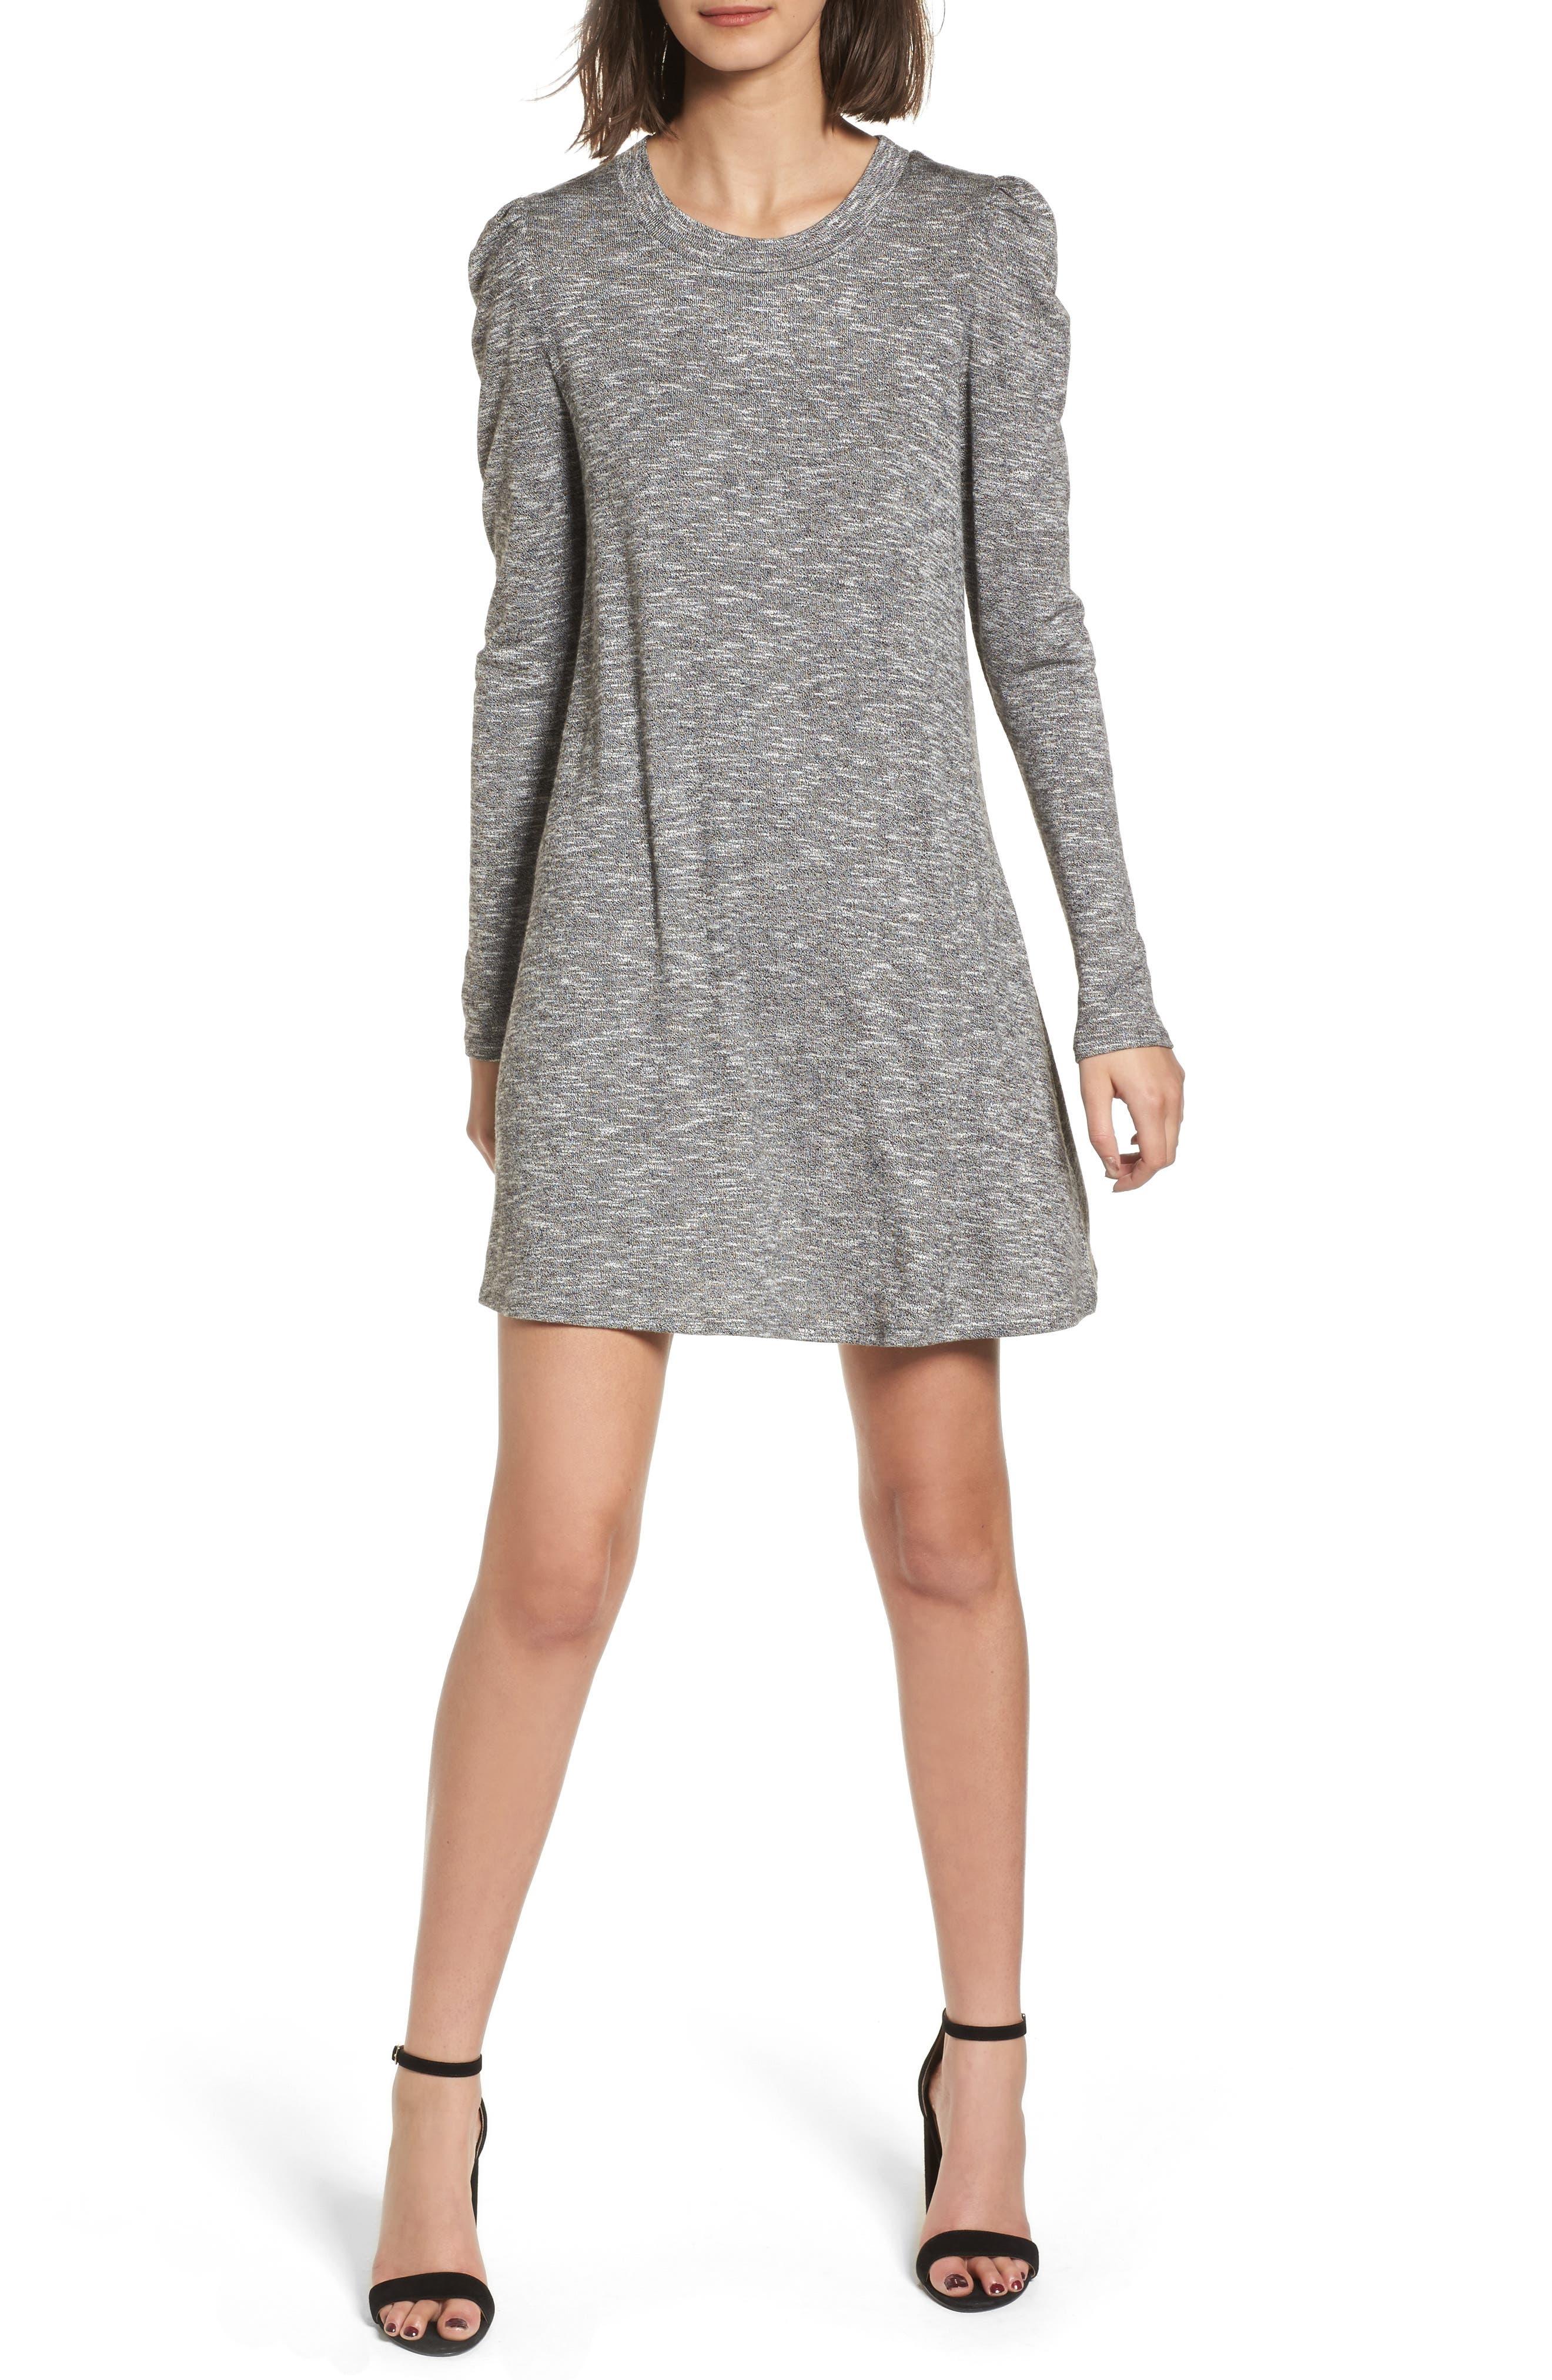 Main Image - Love, Fire Knit Puff Shoulder Dress